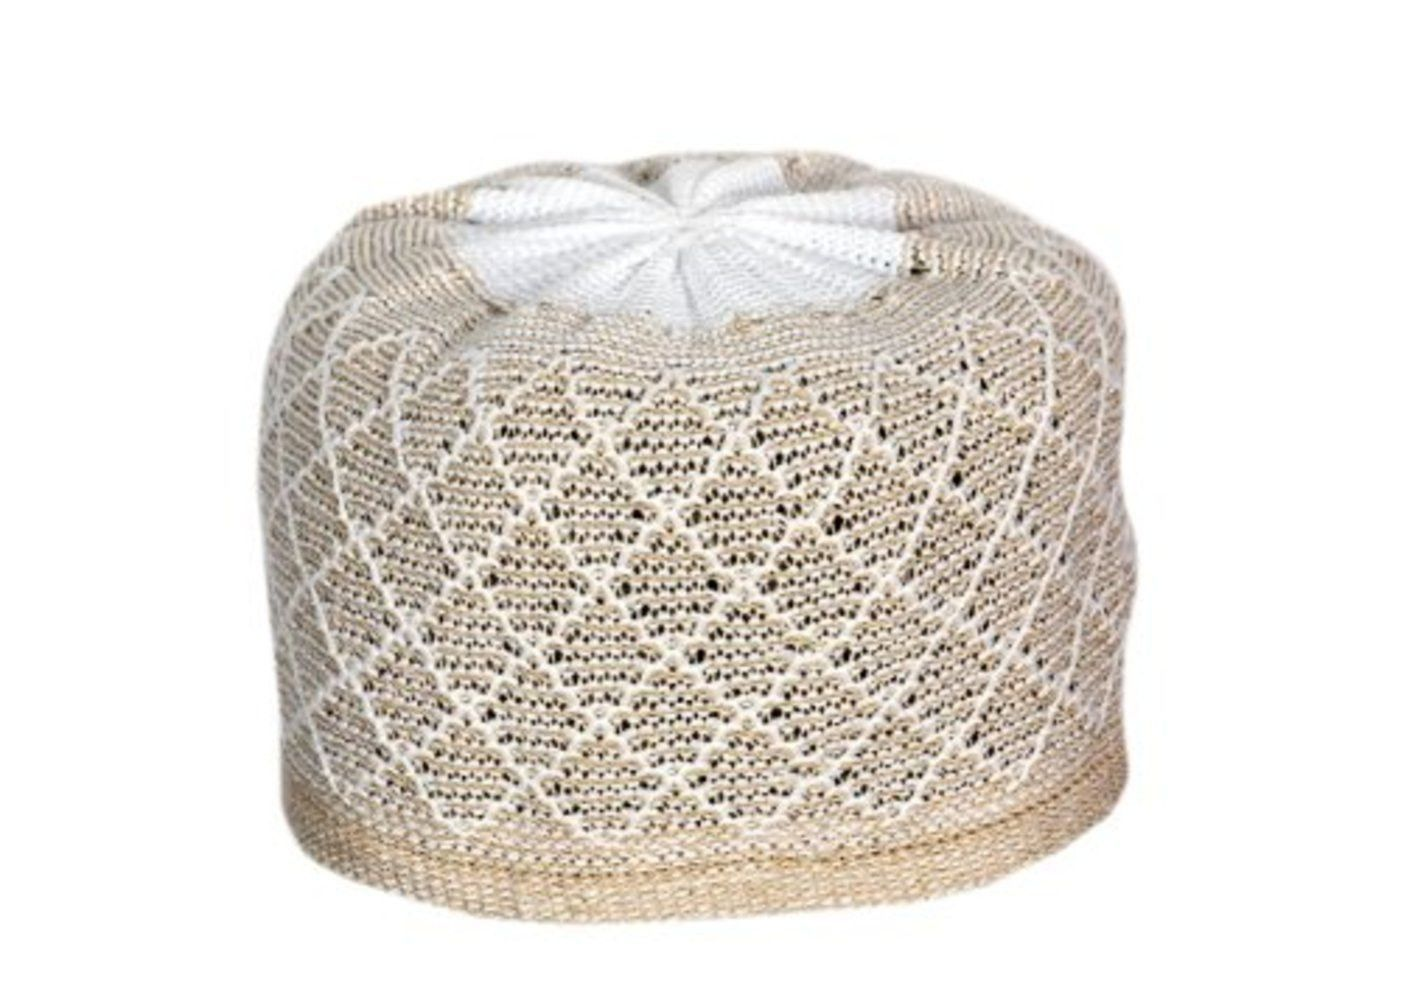 Muslim Prayer Cap Kufi Topi Soft Threads   Block Shaped (Gray   White) 5198ec6aefa1